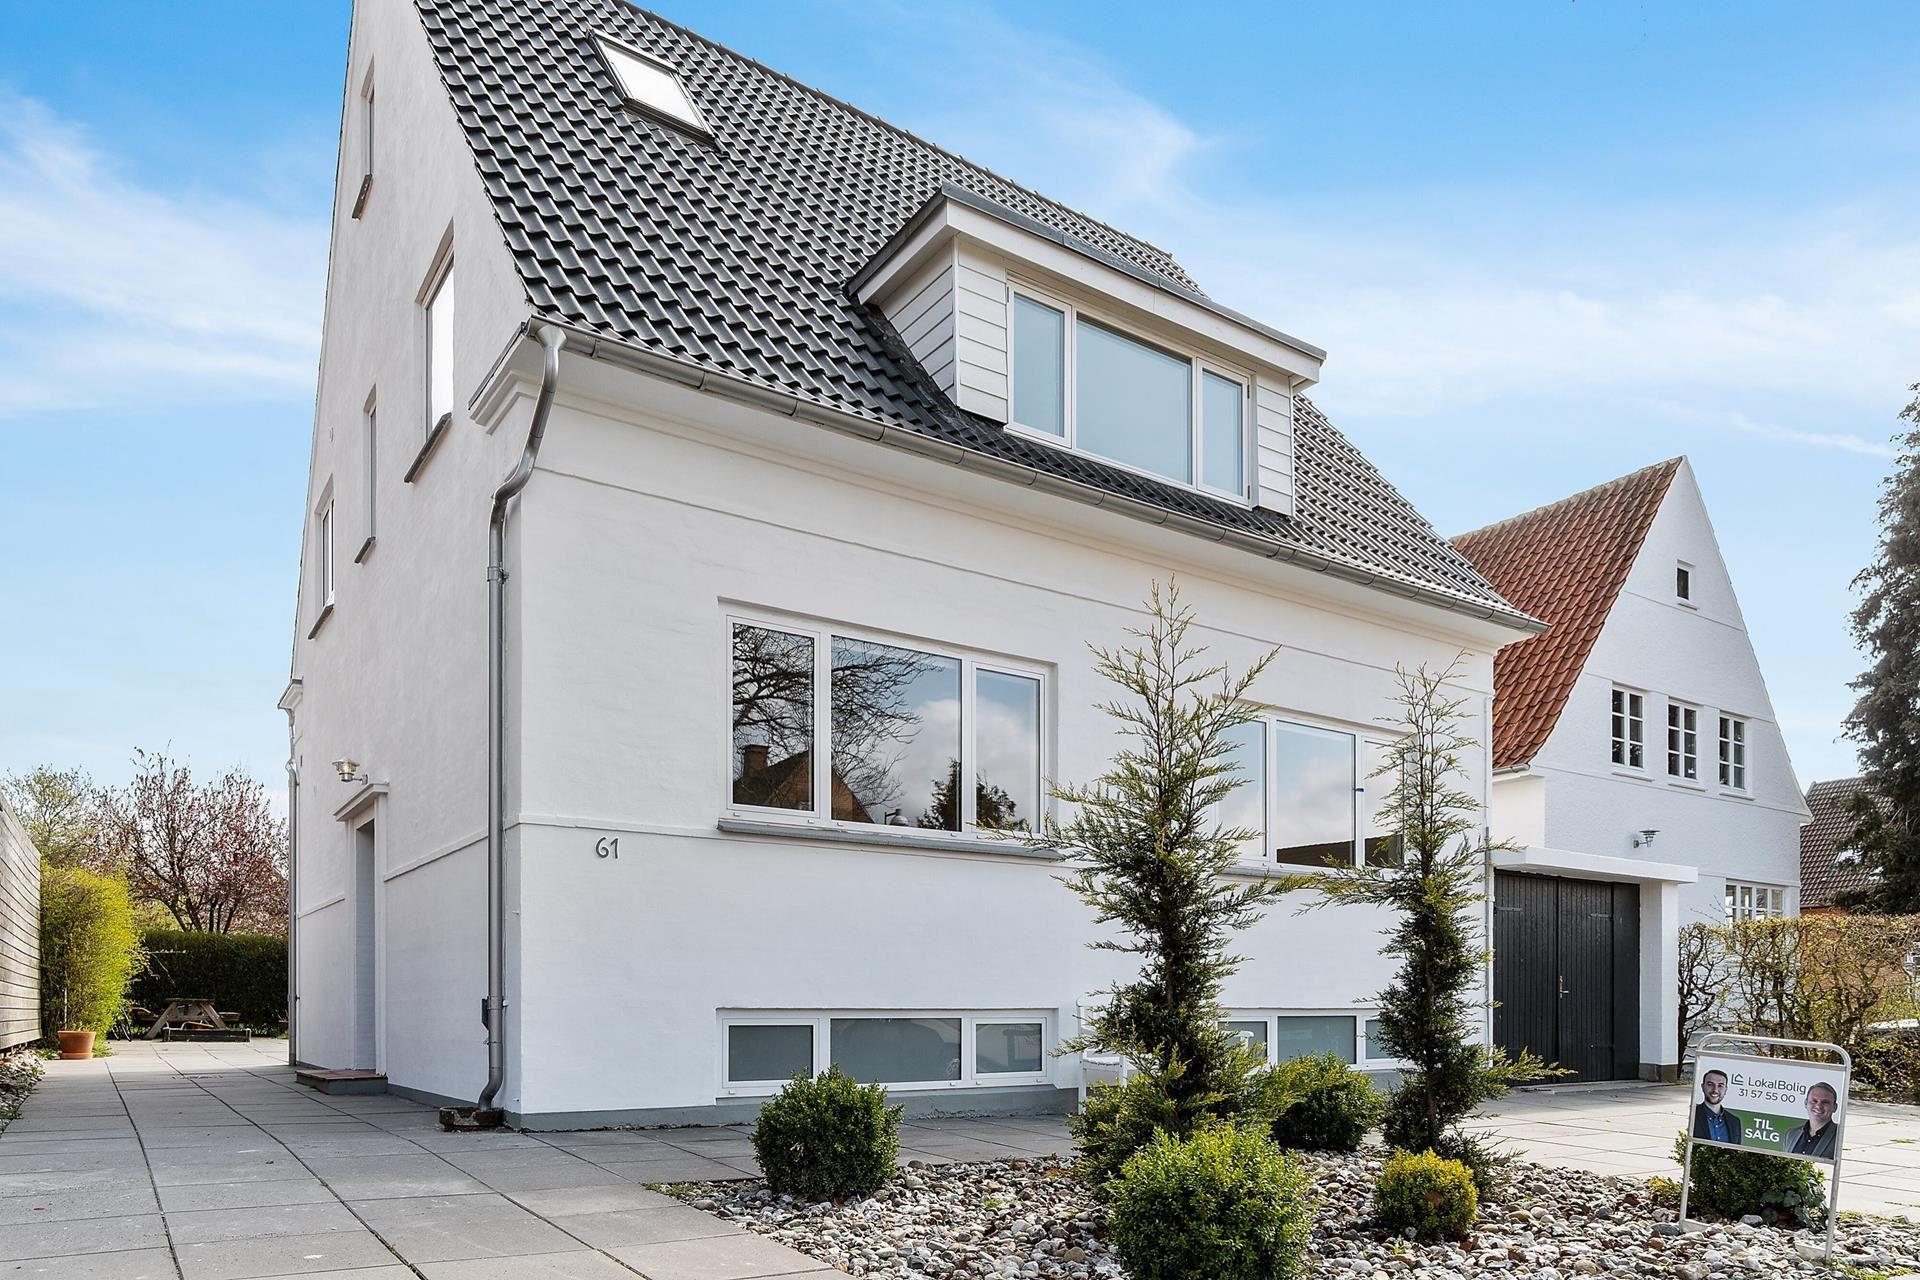 Windelsvej 61, 5000 Odense C